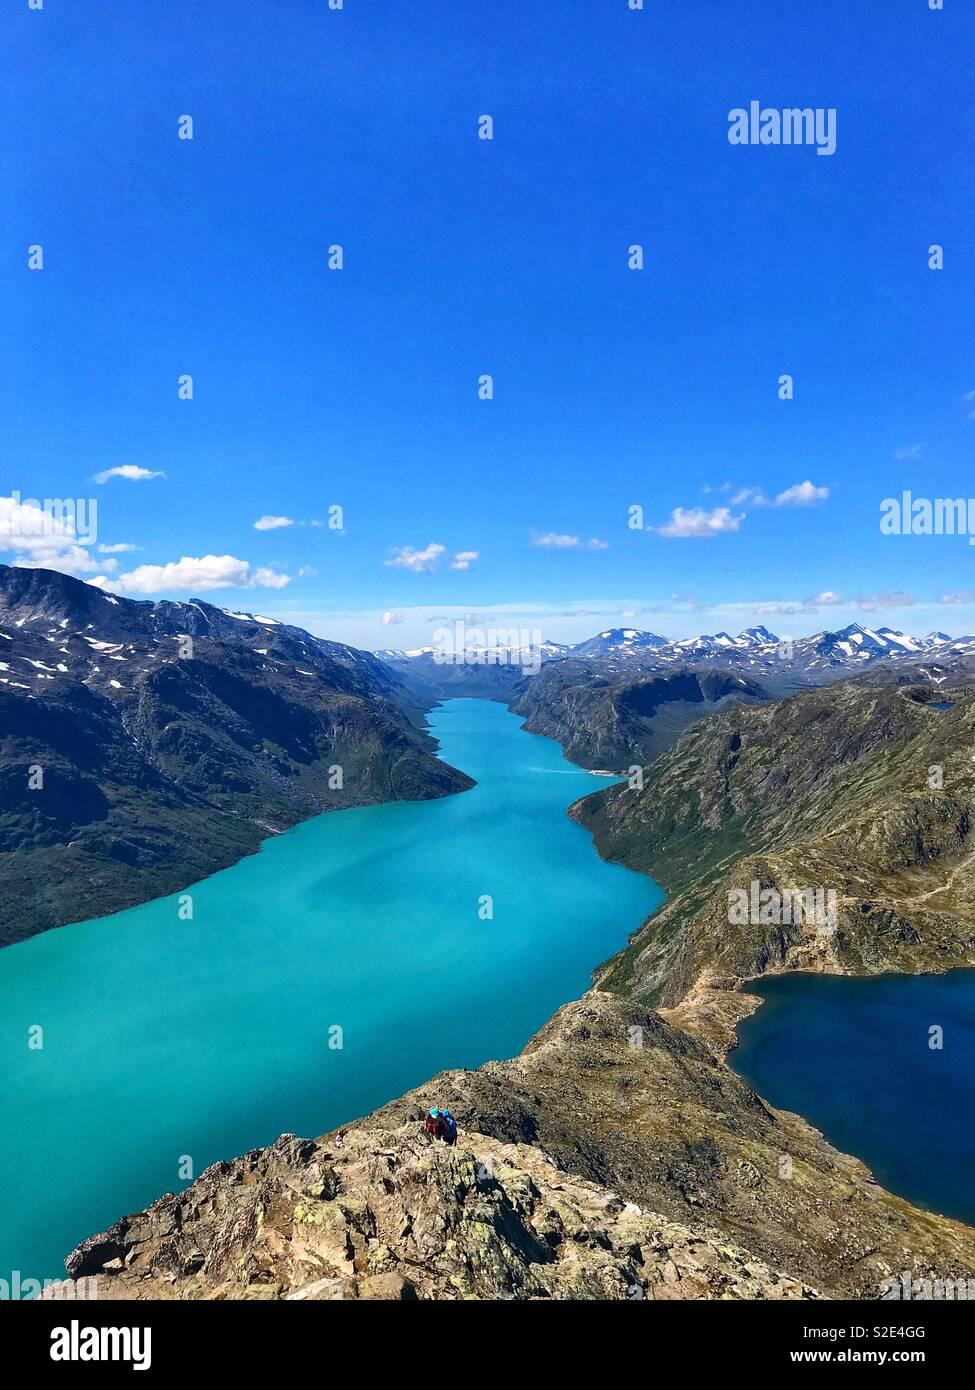 Besseggen, Norwegian mountain. Summer shot - Stock Image